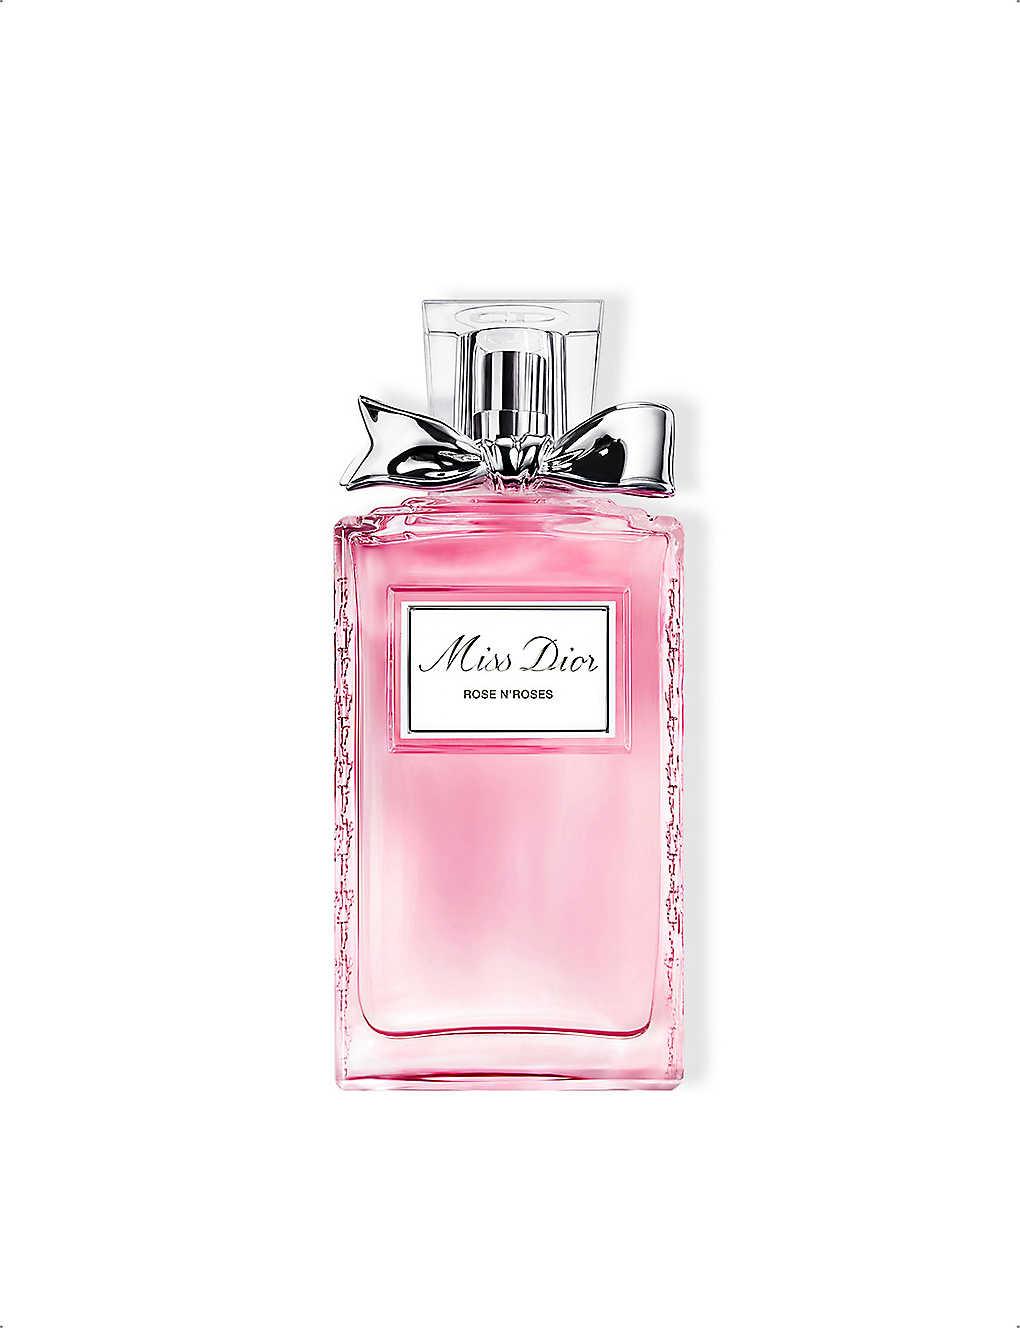 DIOR: Miss Dior Rose N'Roses eau de toilette